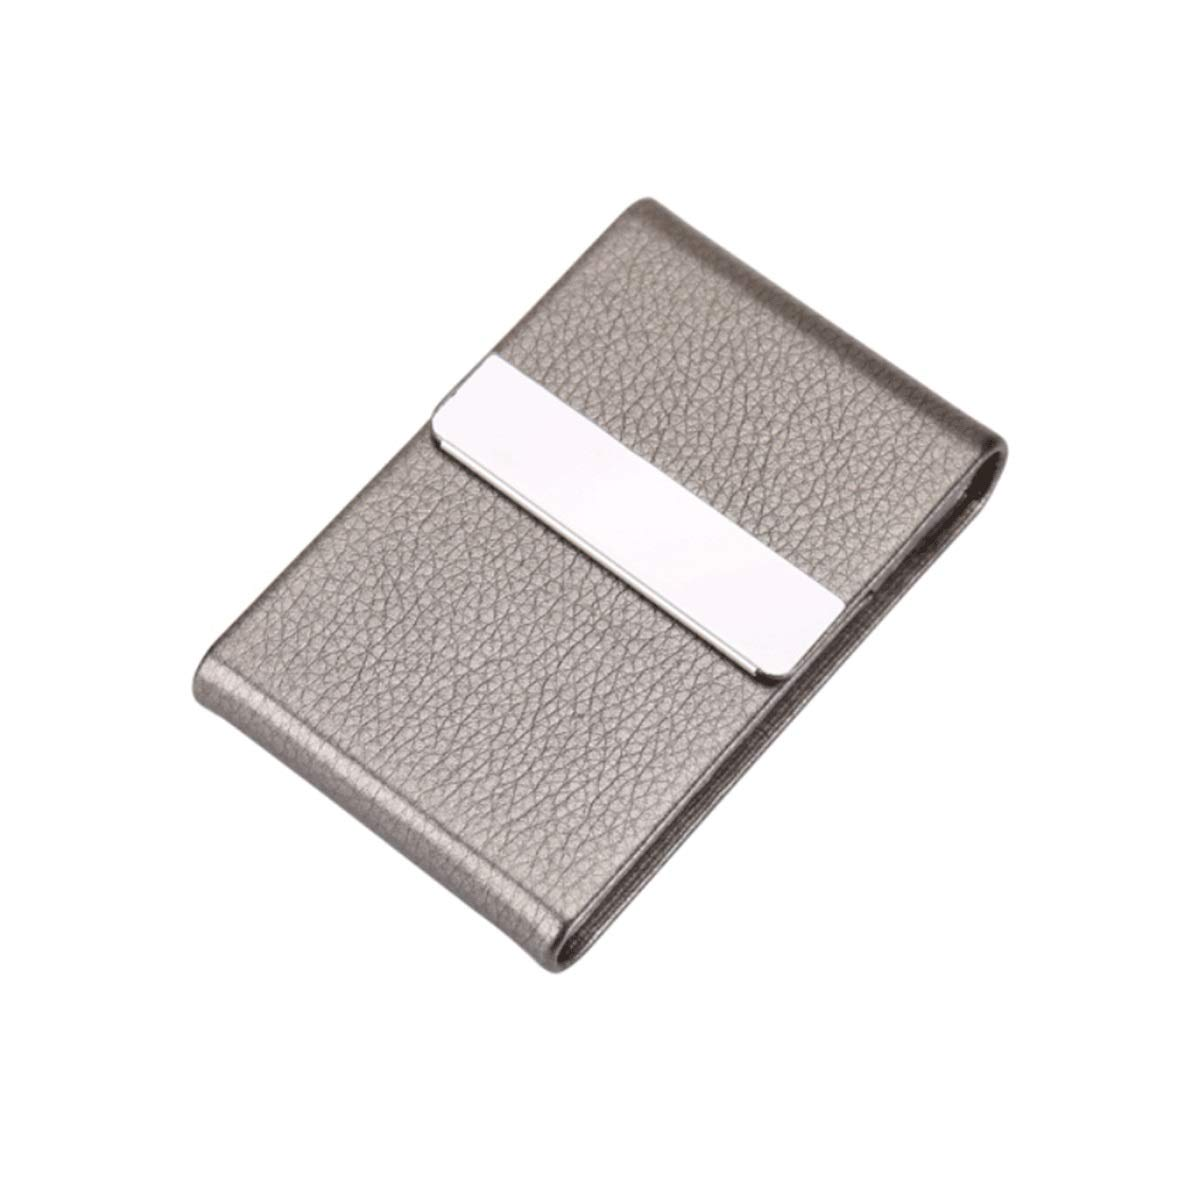 KALMAR Men's Cigarette Case Stainless Metal Personality Classic Flip Cigarette Case Can Hold 7 Cigarettes Cigarette Box Cigar Protective Cover (Color : B)